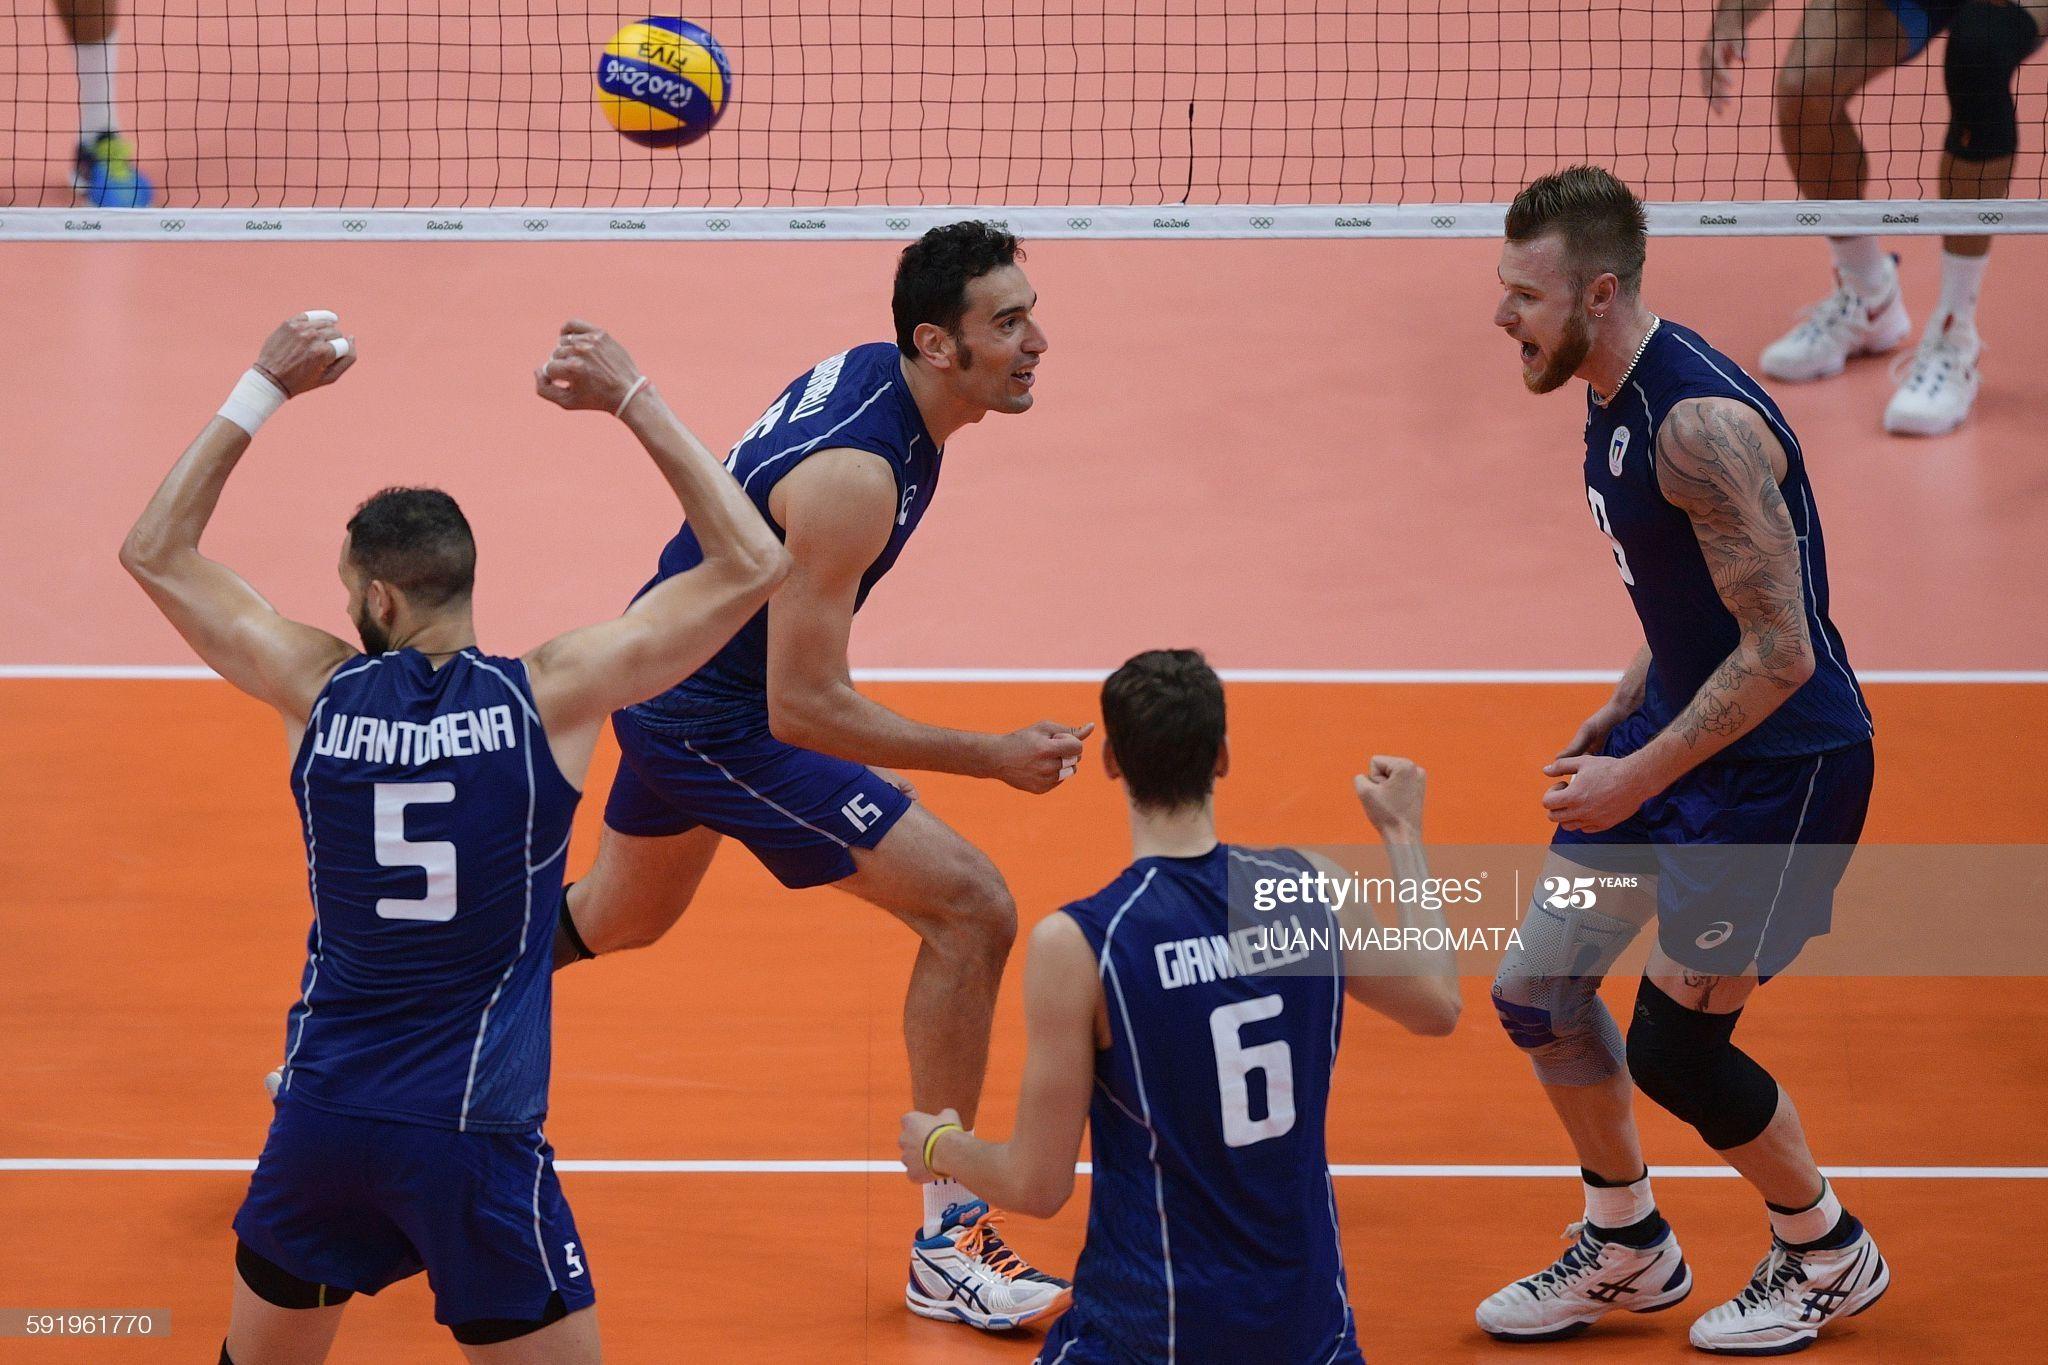 Italy S Osmany Juantorena Italy S Emanuele Birarelli Italy S Simone In 2020 Olympic Games Rio Olympics 2016 Volleyball